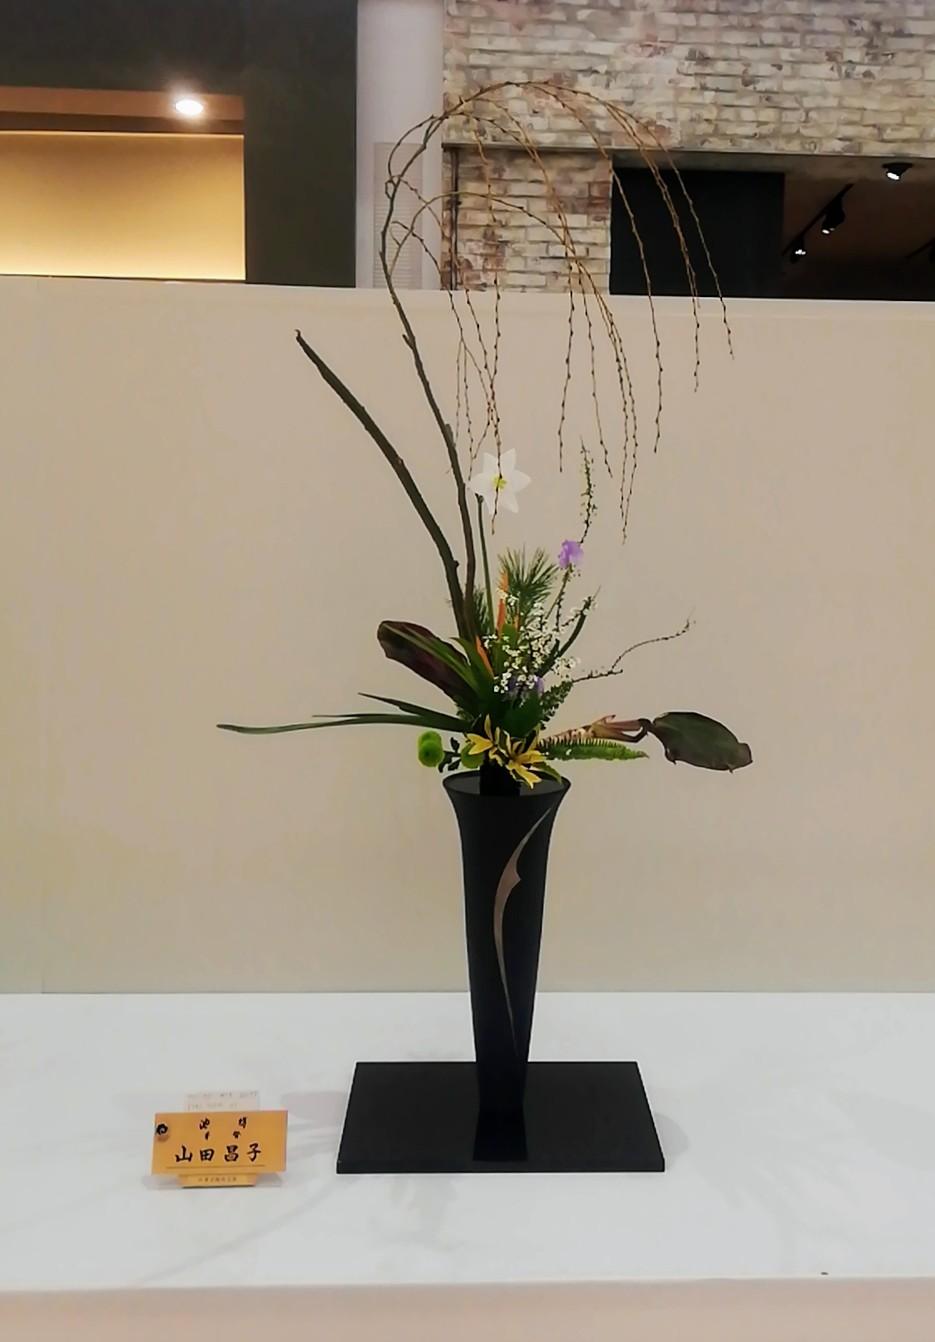 池坊佐賀県連合支部創立100周年記念いけばな池坊展 後期_d0195183_21561152.jpg